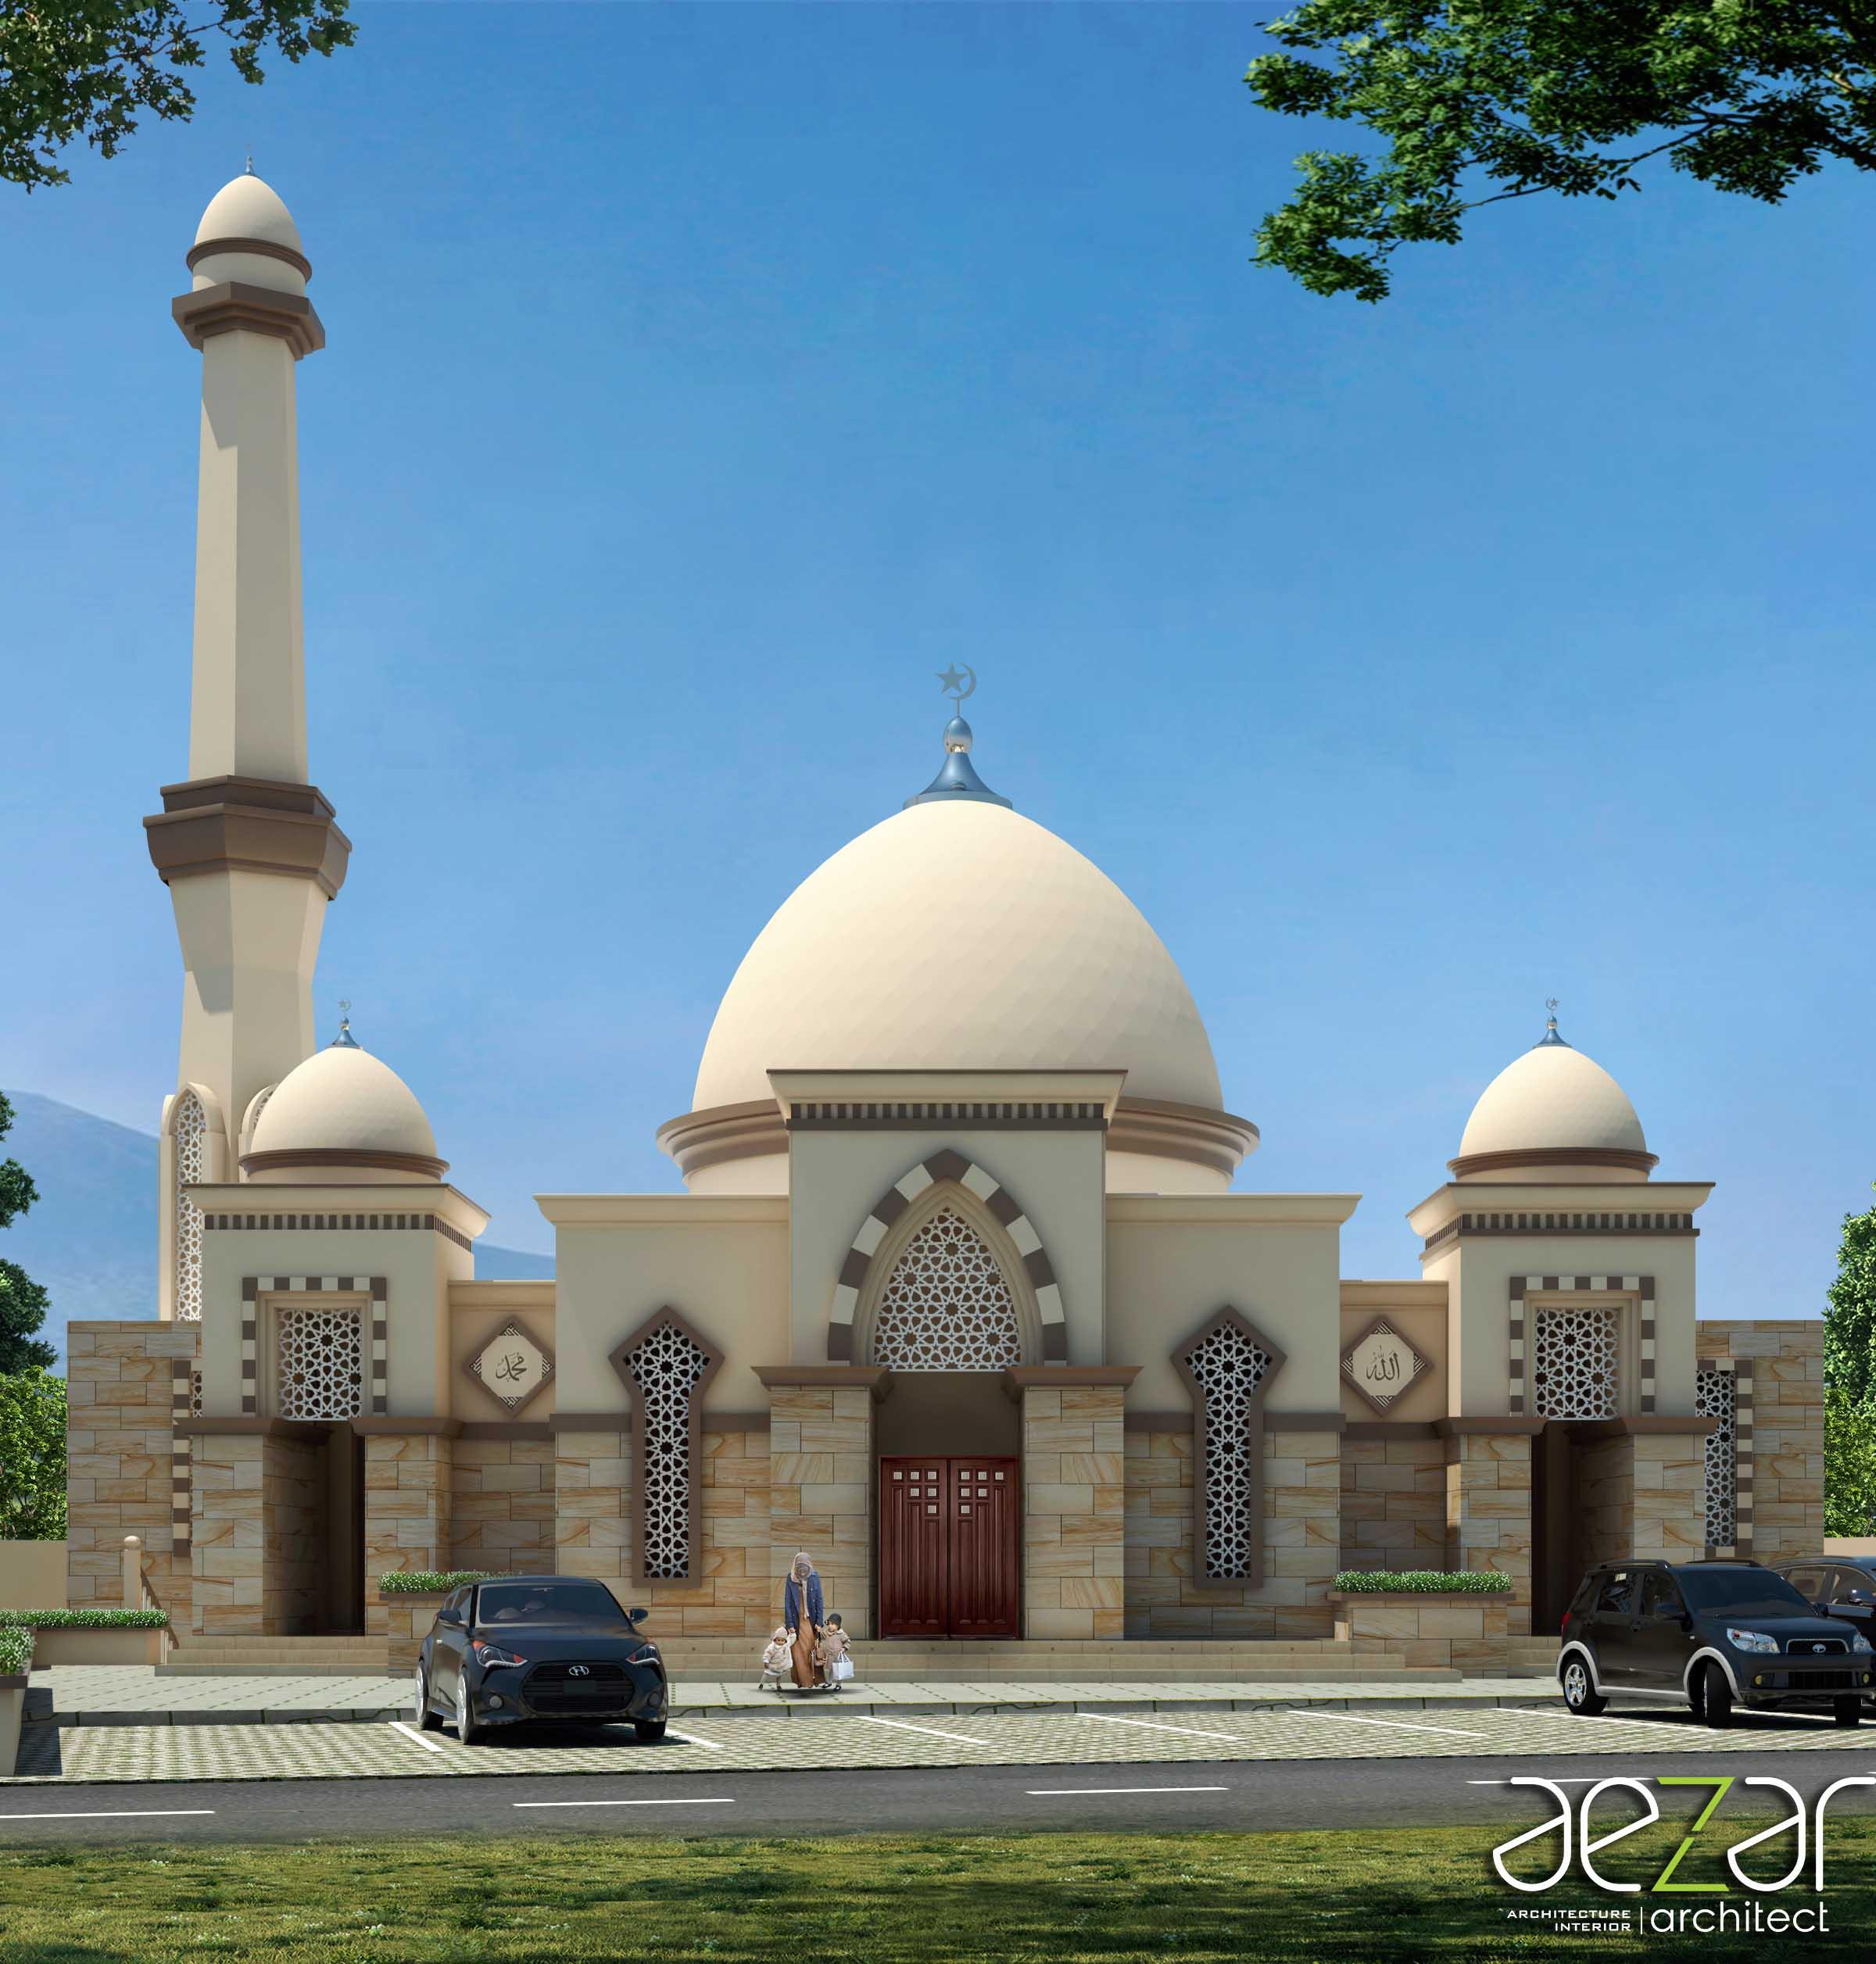 Aezar Architect Baitussalam Mosque Kabupaten Sragen, Jawa Tengah, Indonesia Kabupaten Sragen, Jawa Tengah, Indonesia Front View Asian  54435